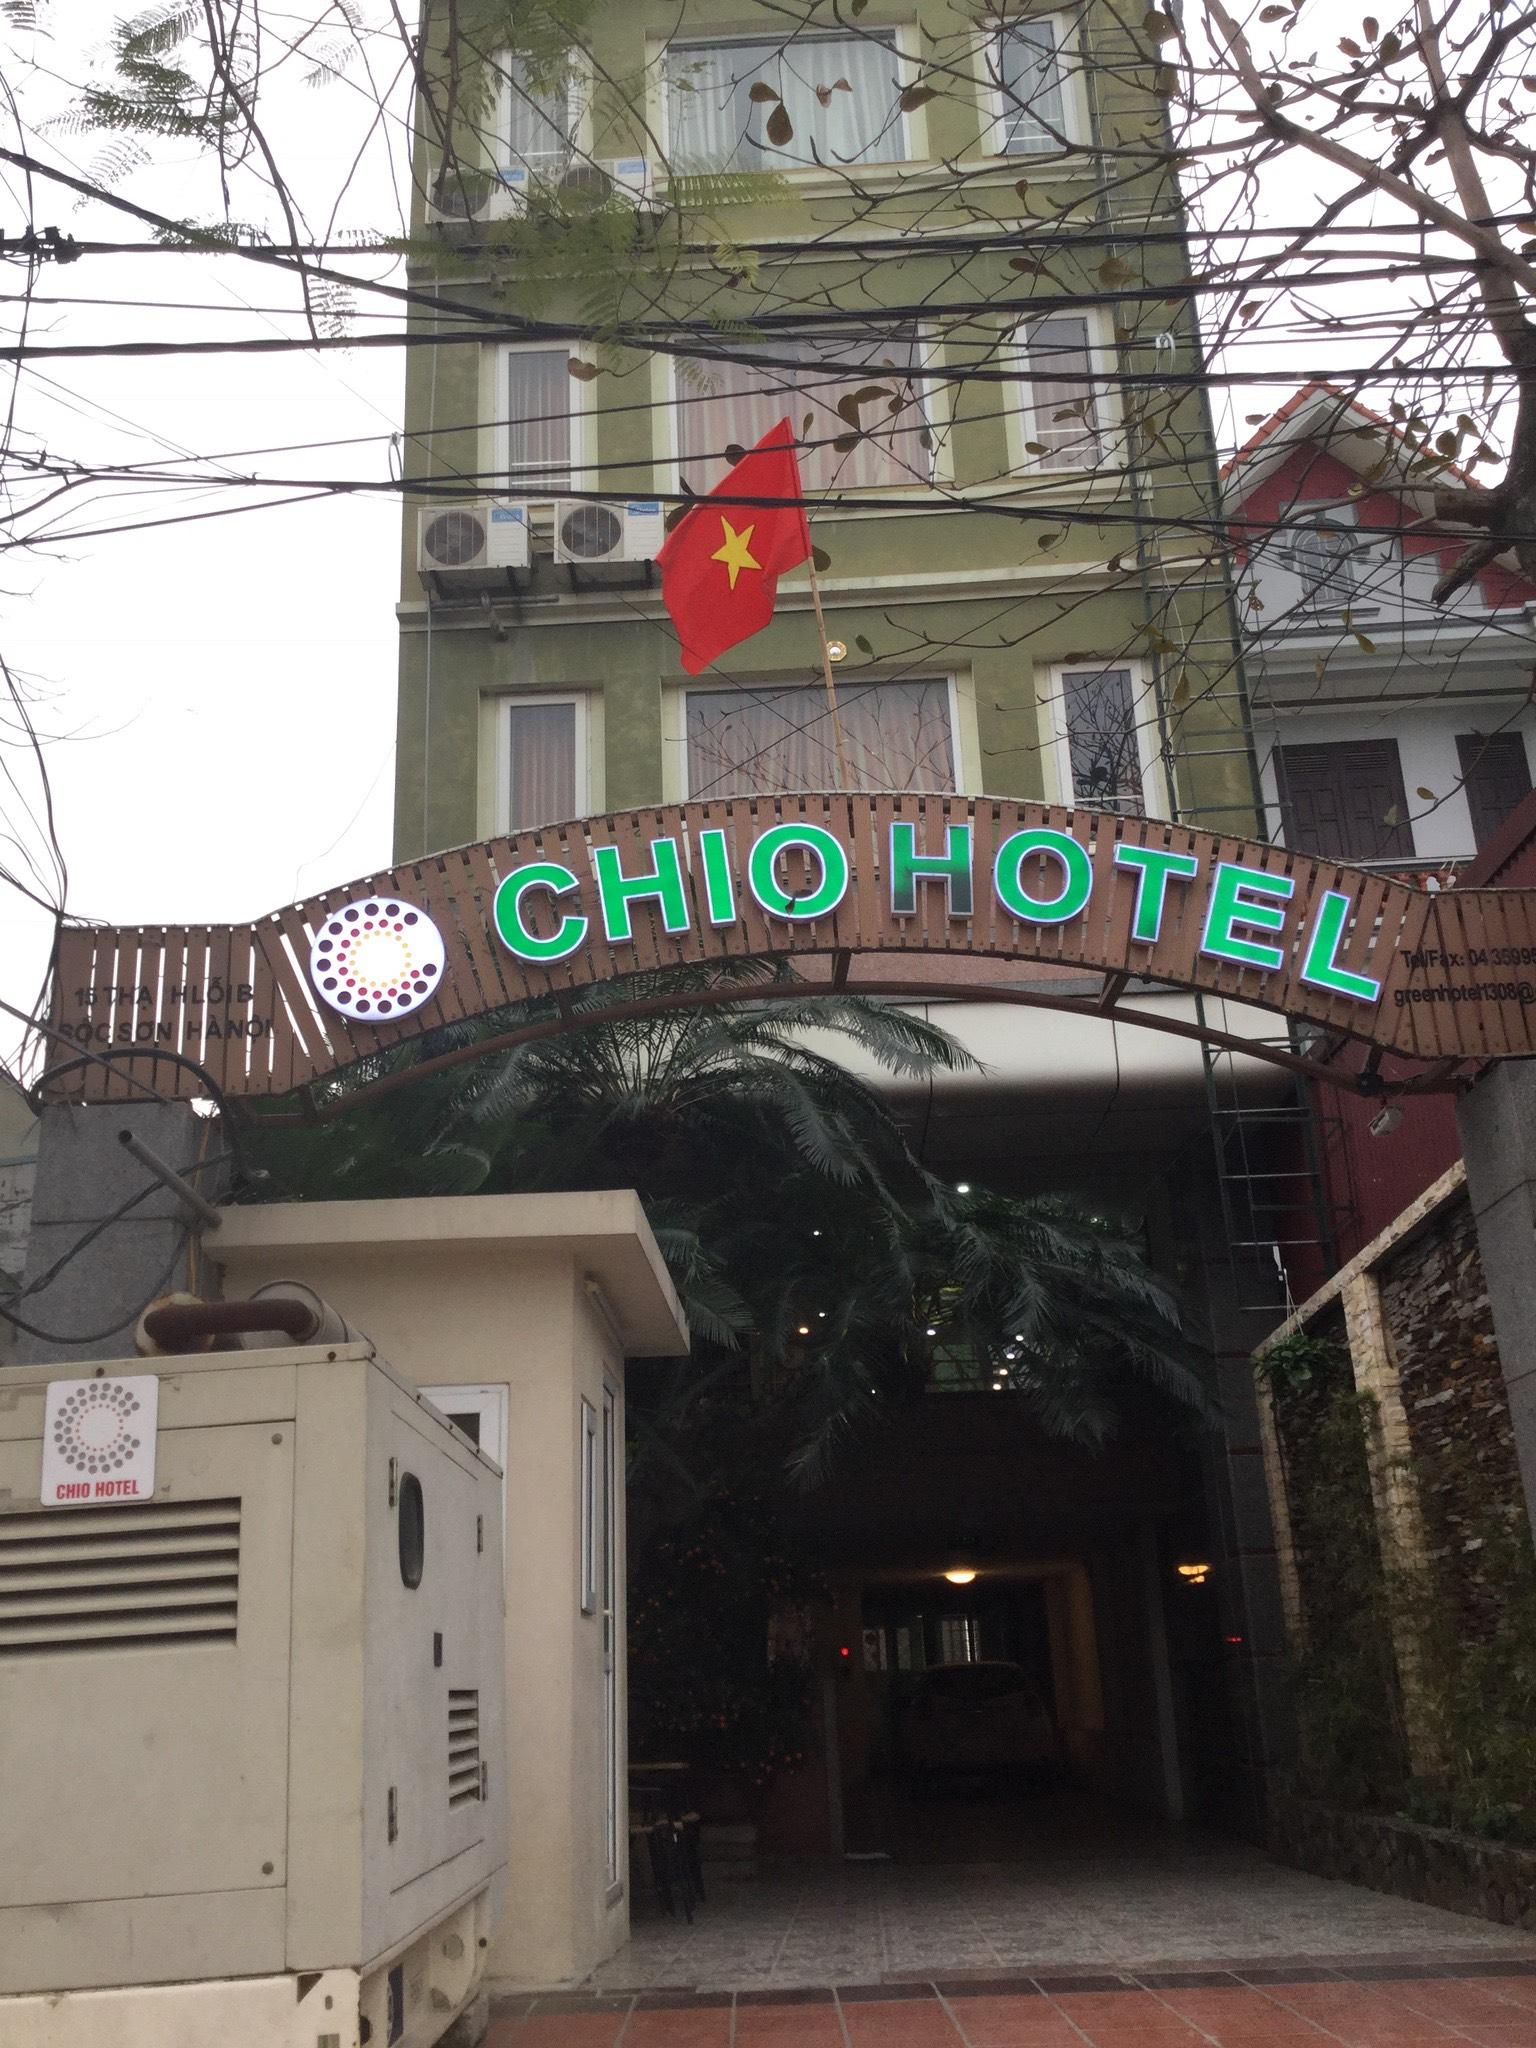 Chio Hotel and Apartment, Sóc Sơn